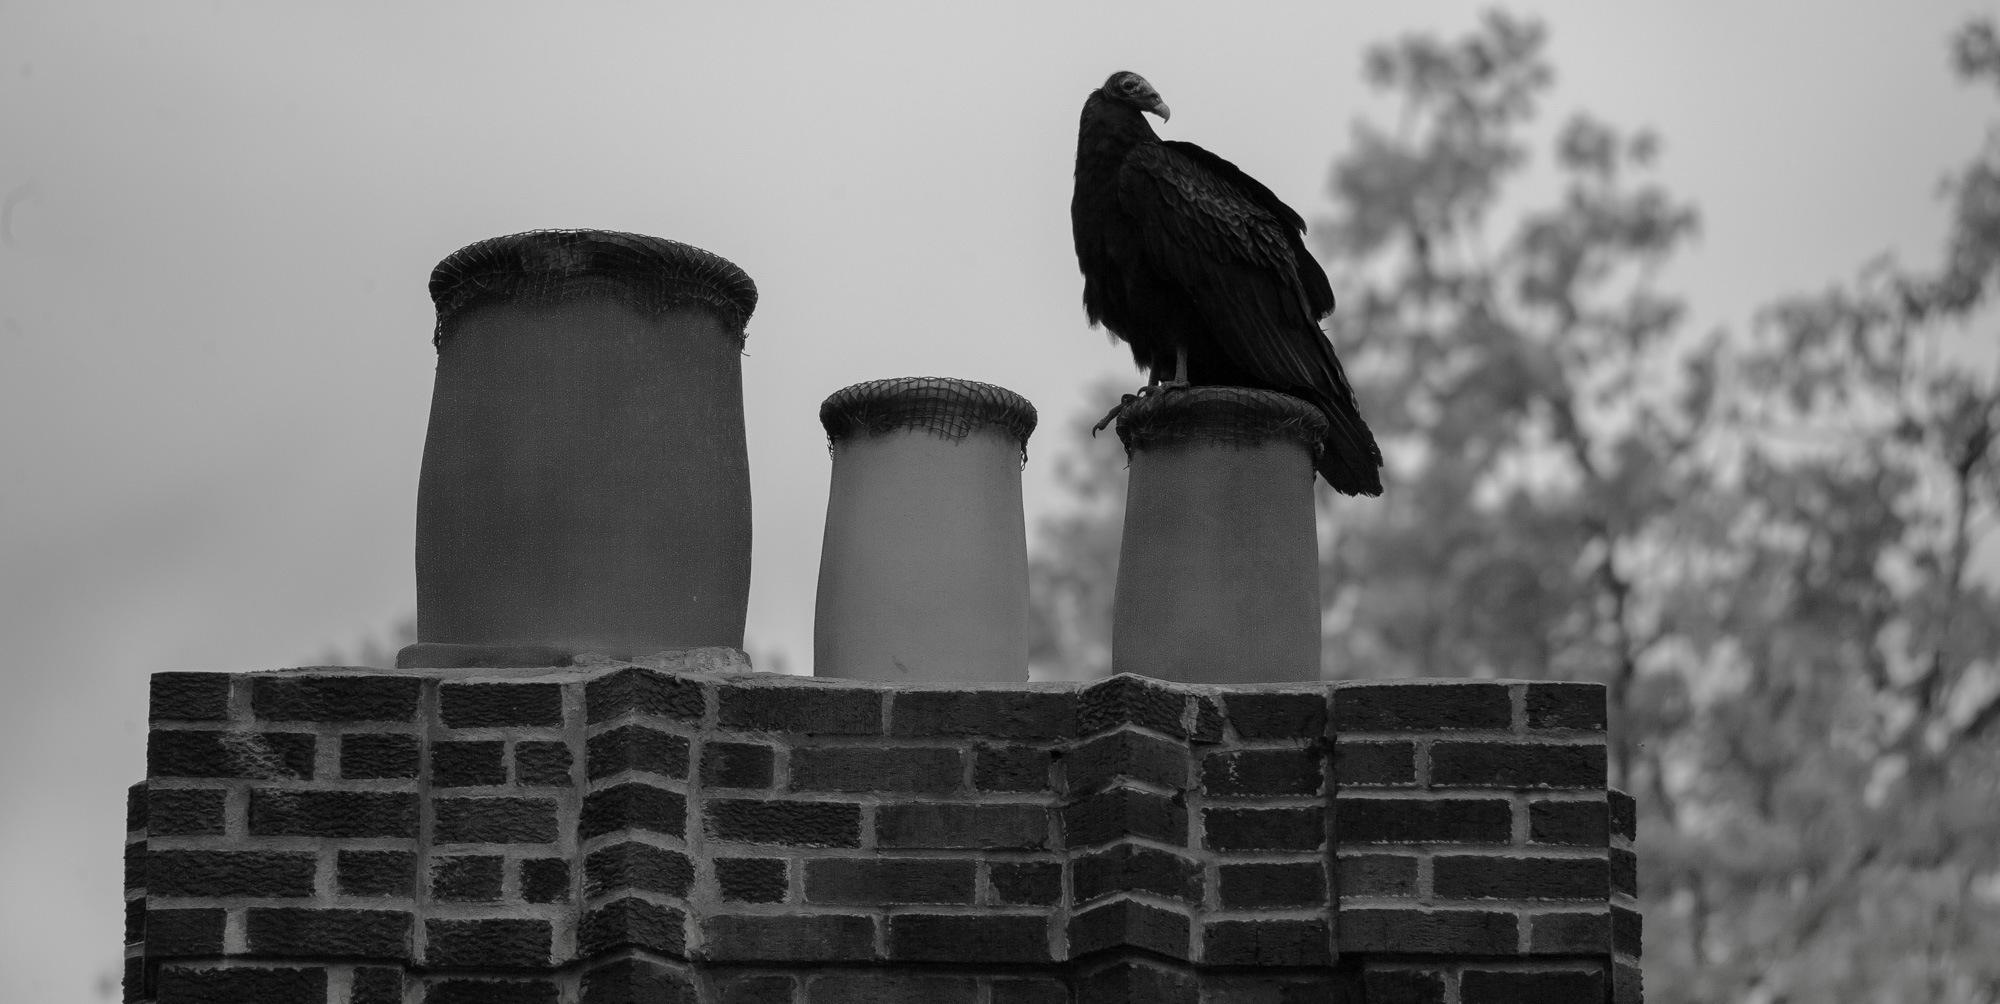 Turkey Vulture on chimney stack by Lawrence Splitter